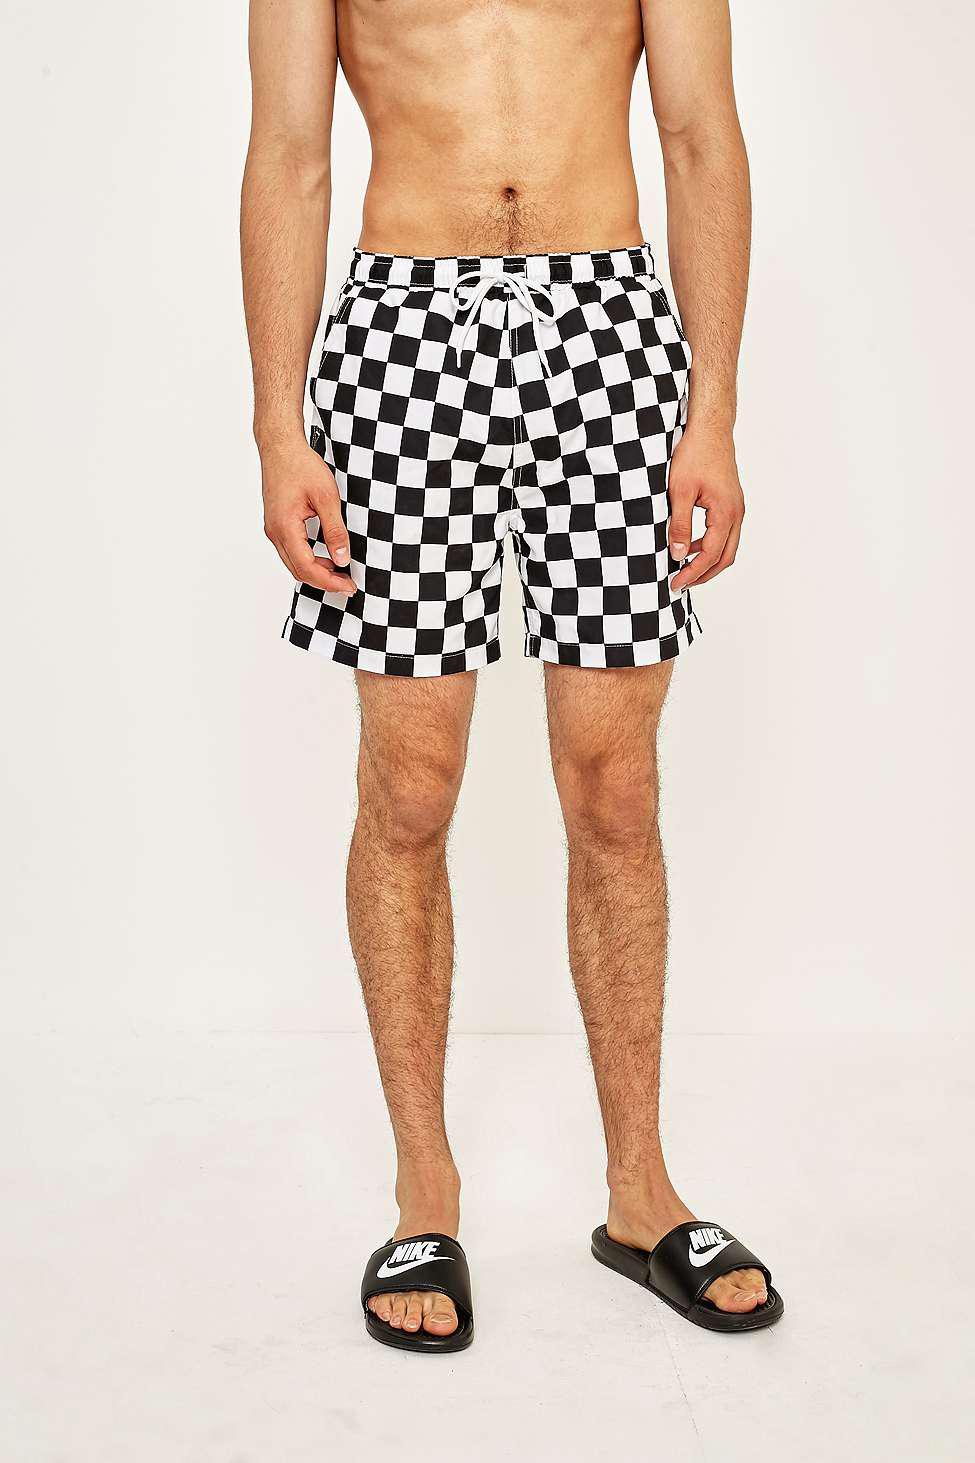 cdc8c11147 Urban Outfitters Uo Swim Black And White Checkerboard Swim Shorts ...